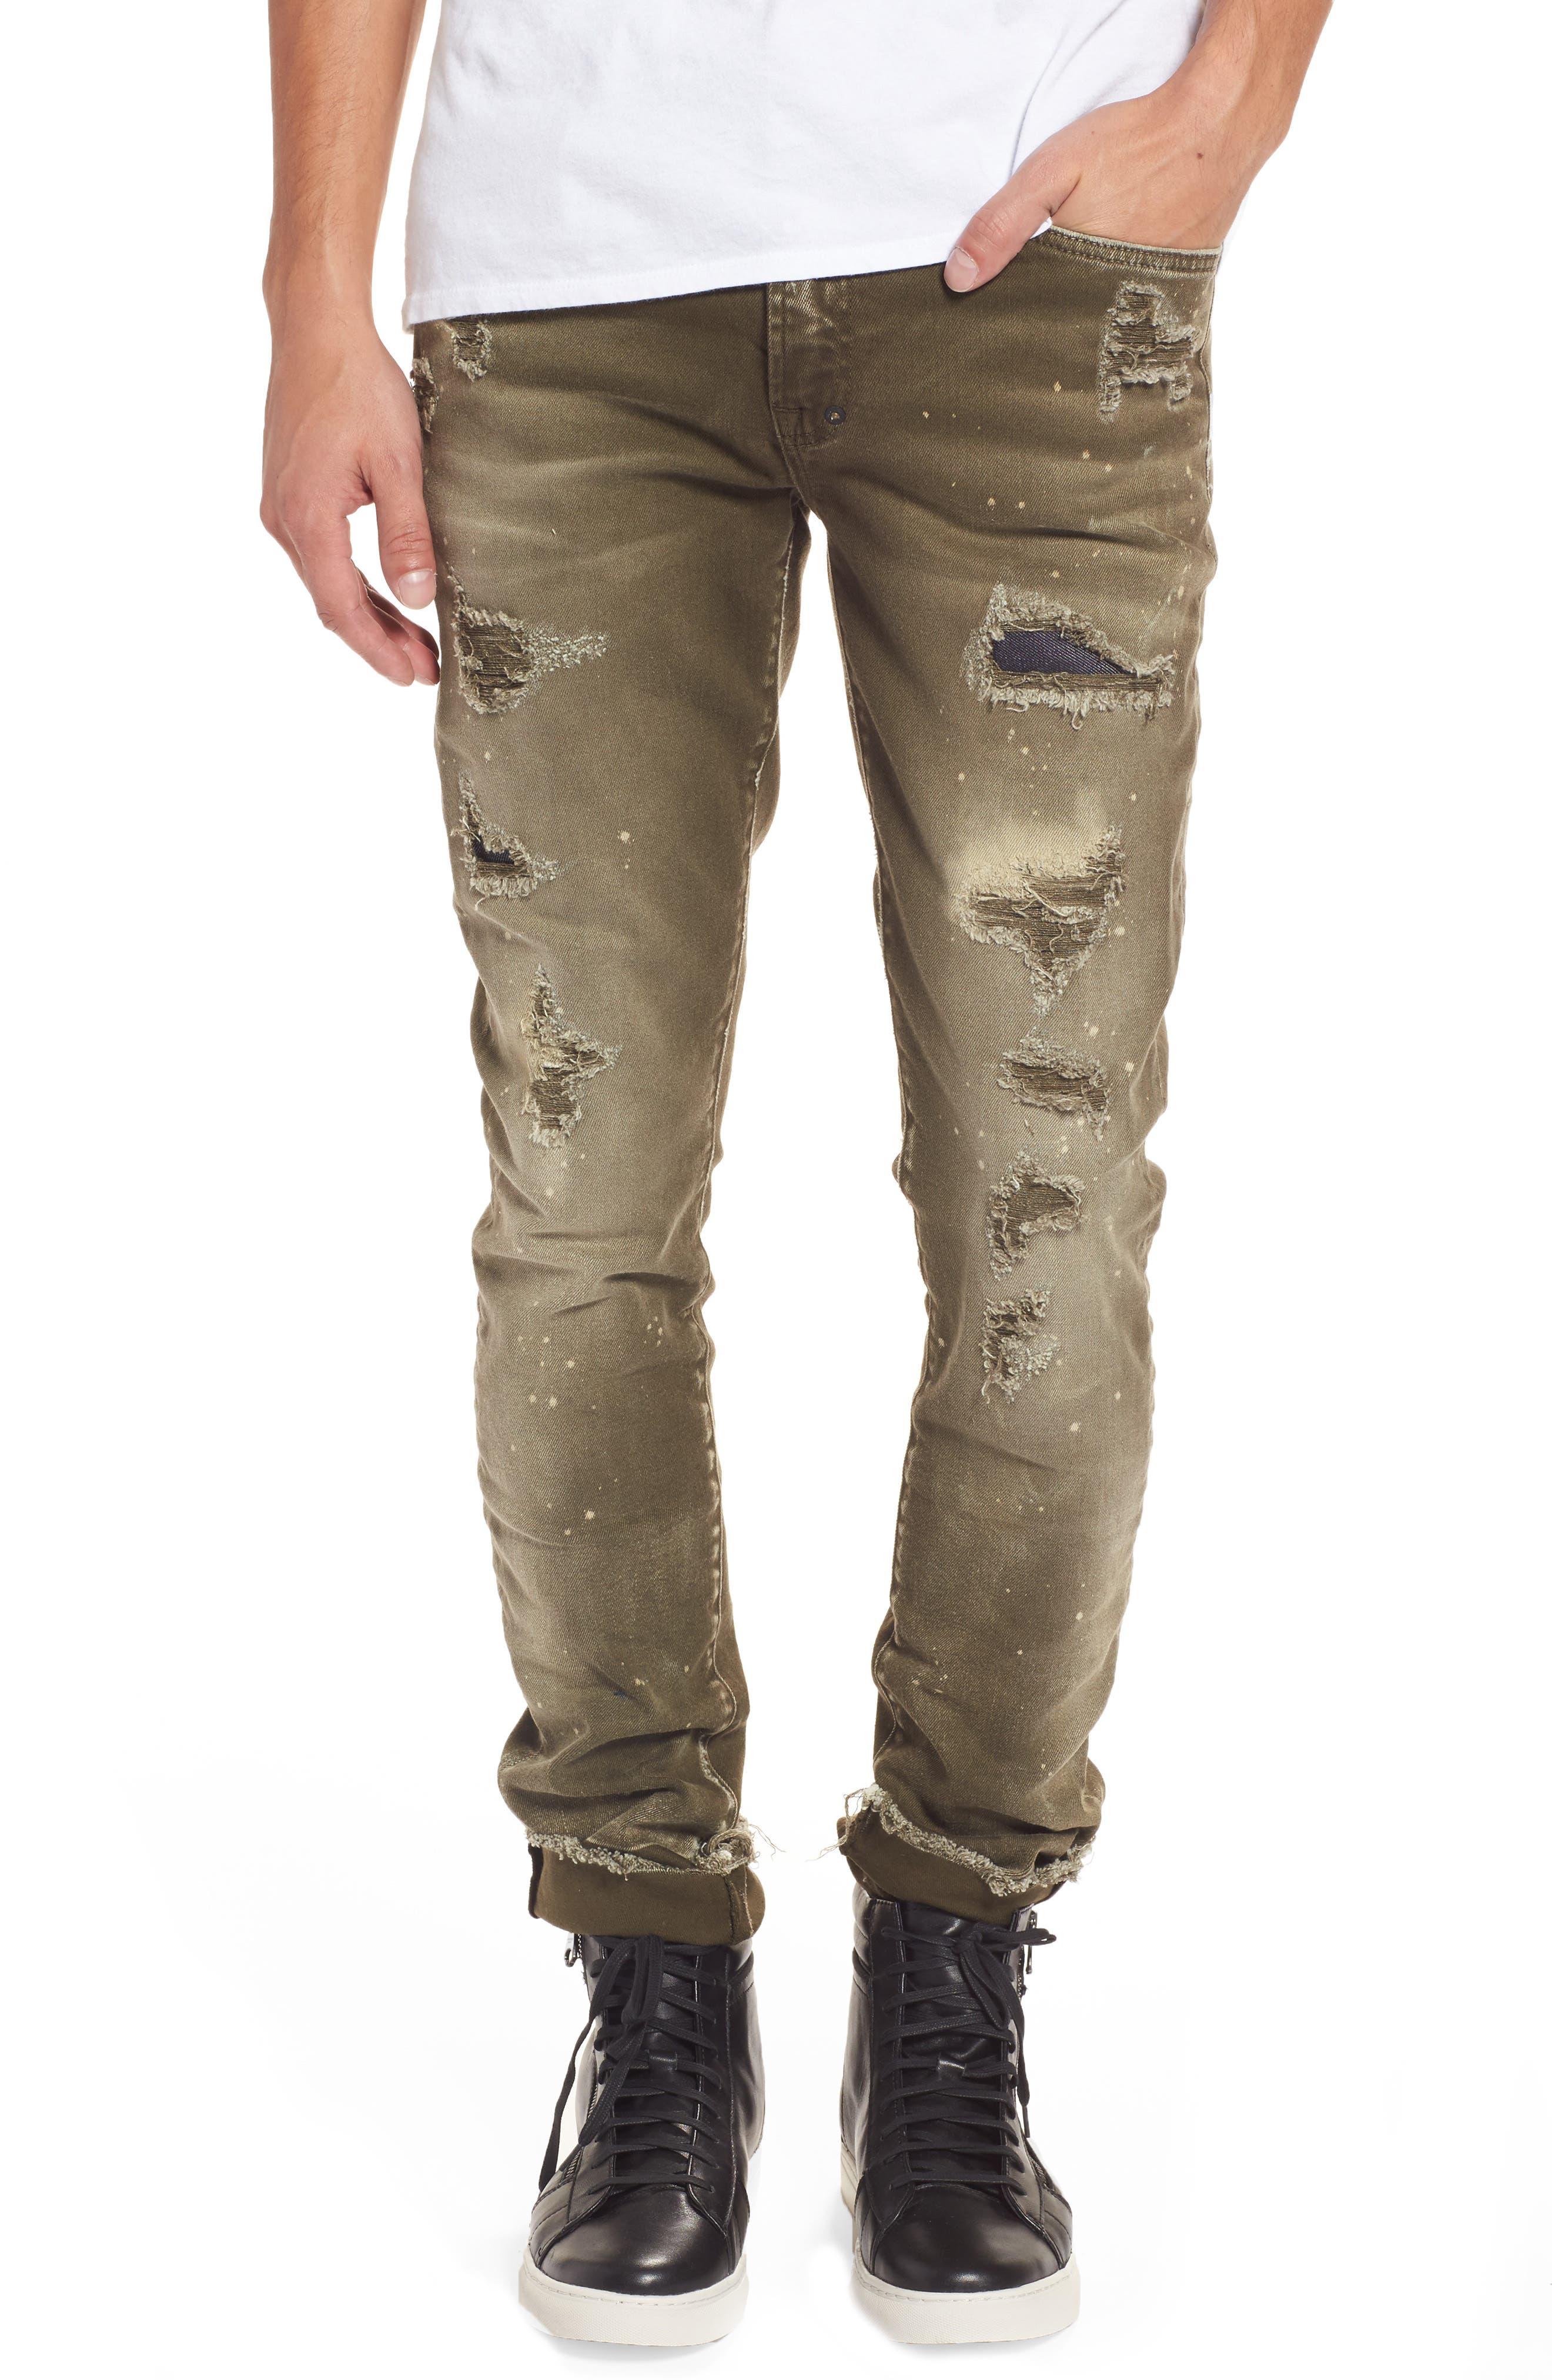 Demon Slim Straight Leg Jeans,                             Main thumbnail 1, color,                             Light